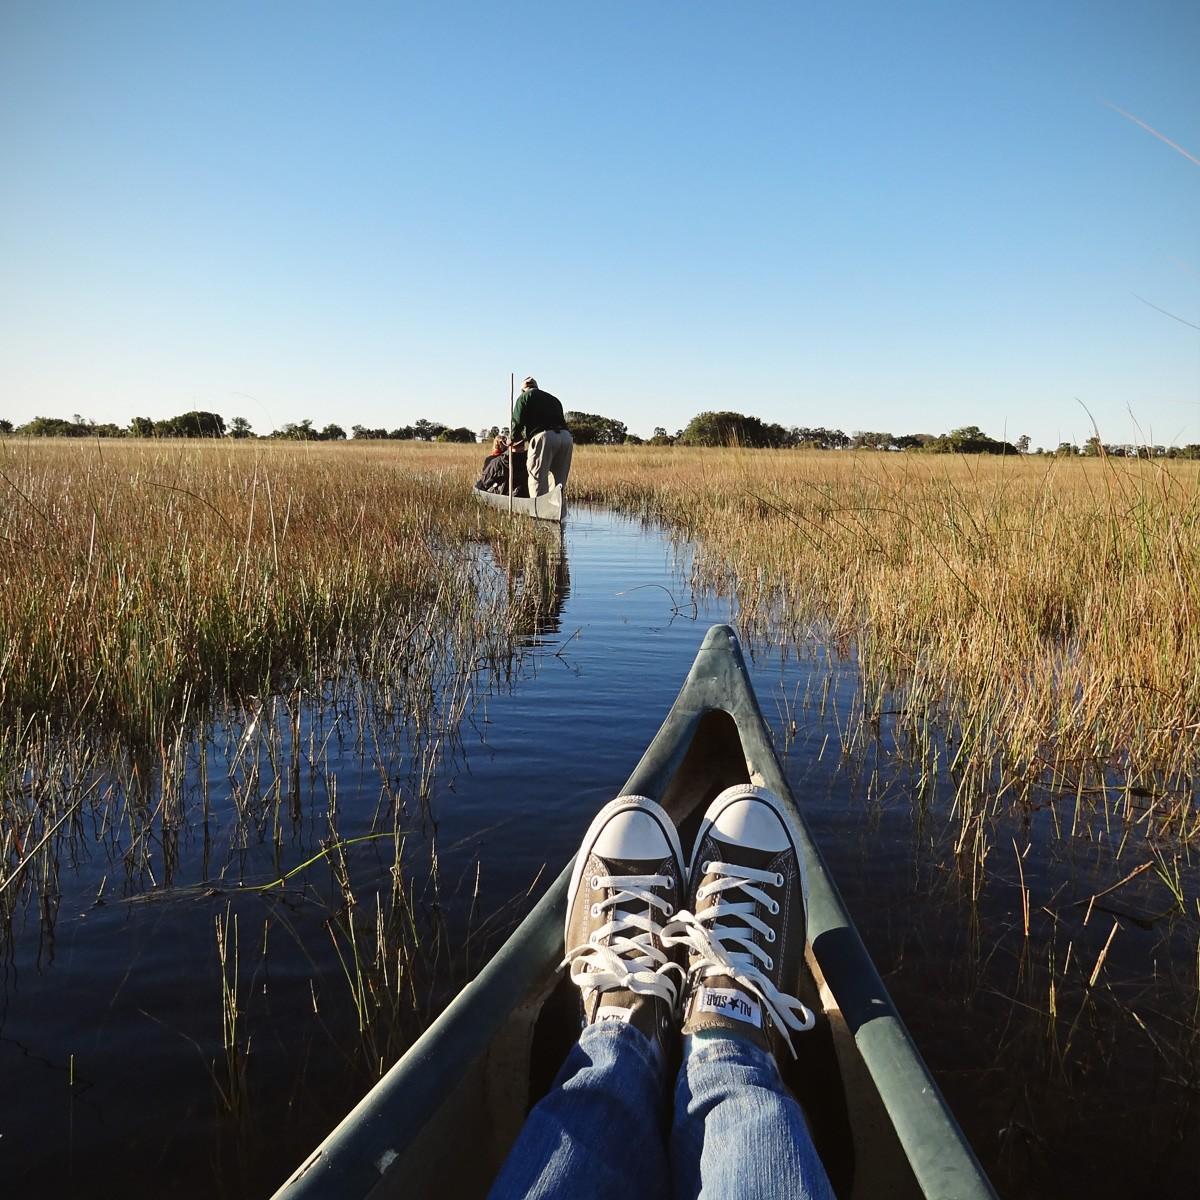 Okavango Detlta on a Mokoro